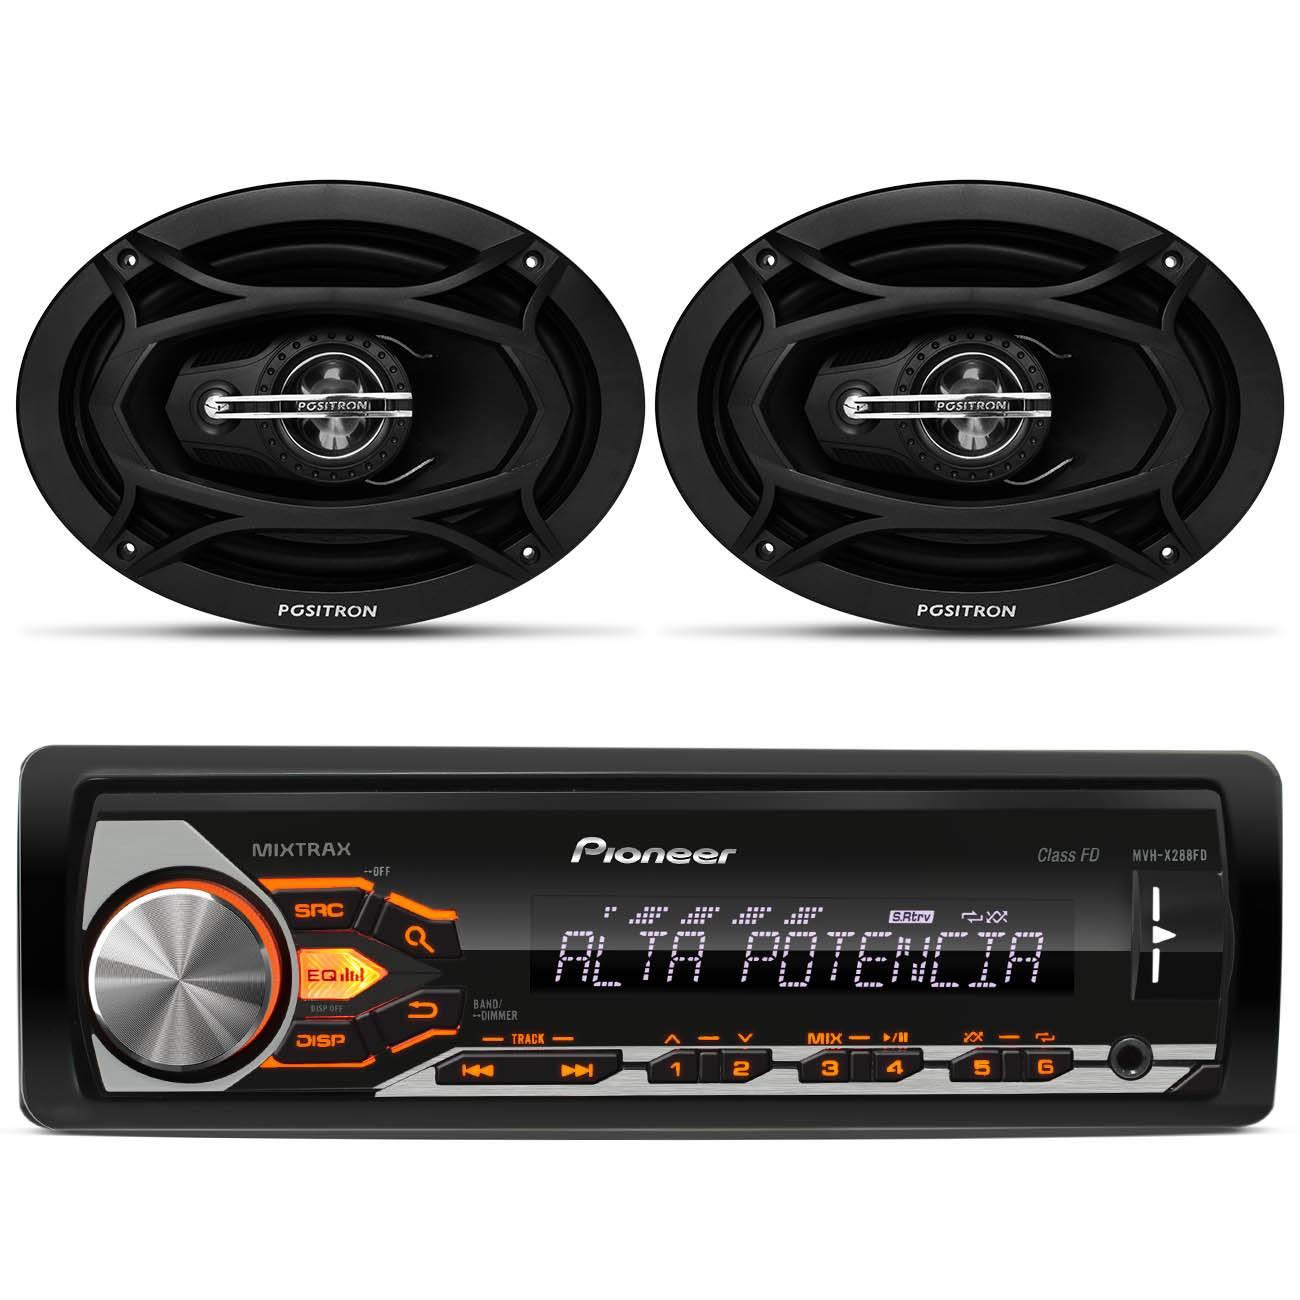 MP3 Player Pioneer MVH - X288FD USB WMA 1 Din + Par Alto Falante Positron 6x9 Polegadas 160W RMS